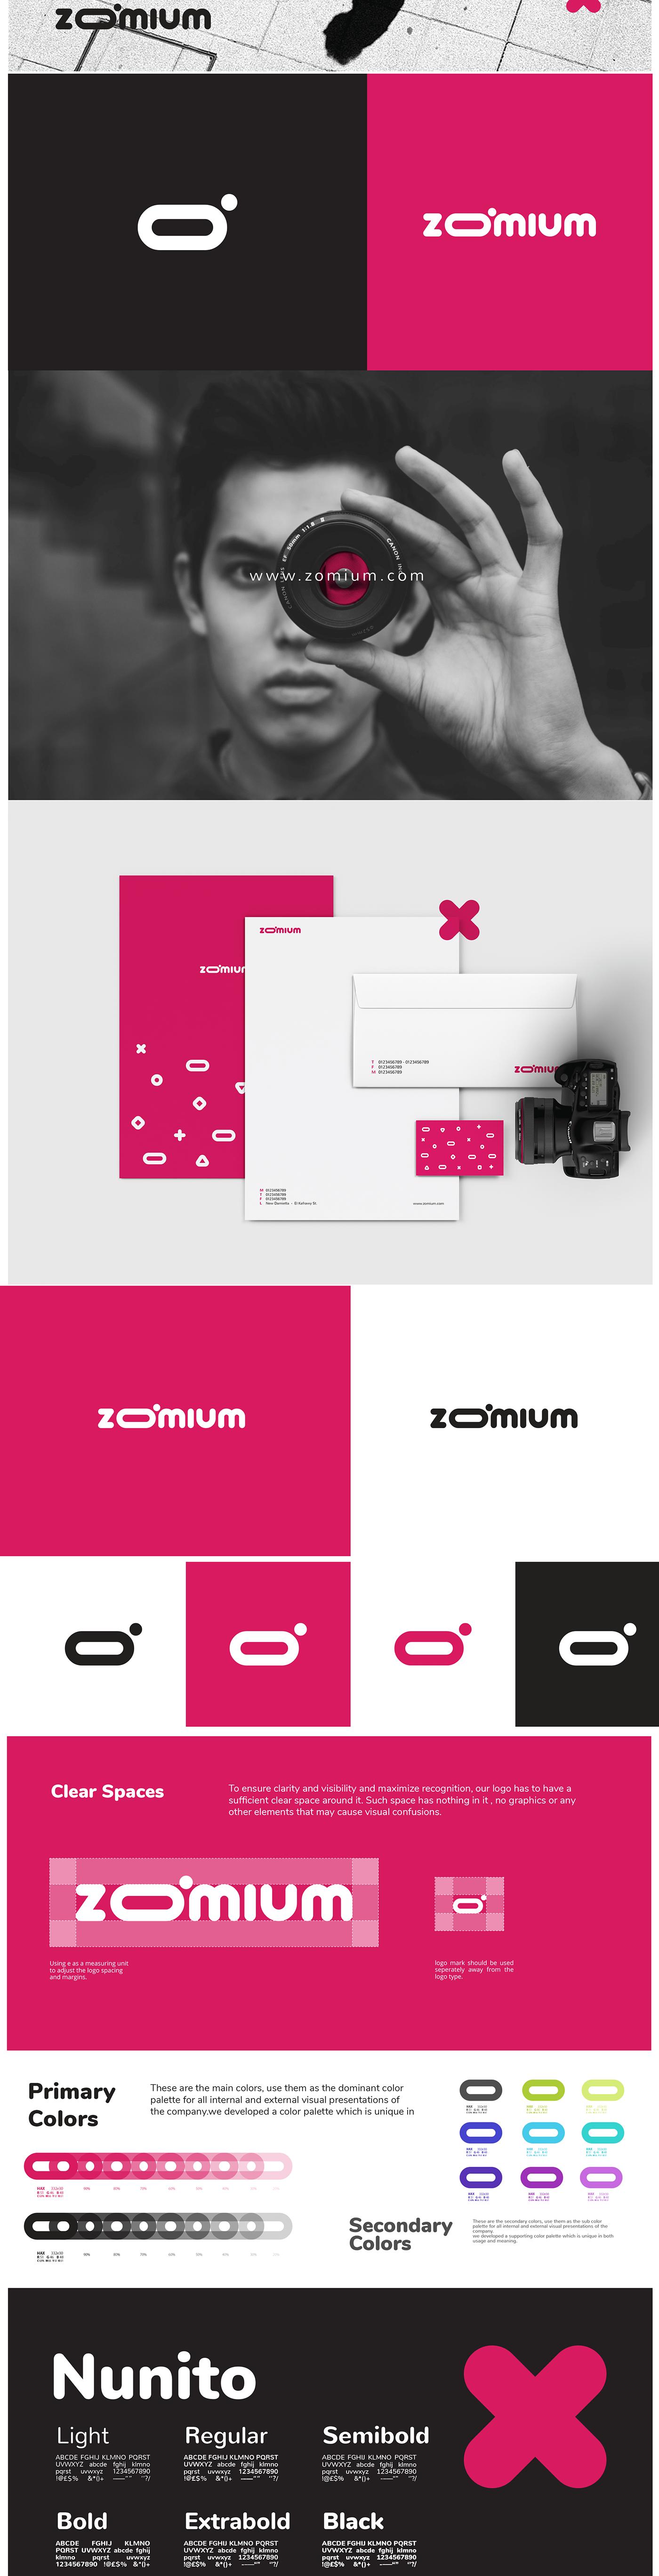 branding ,brand identity,visual identity,Web Design ,Photography ,Mobile app